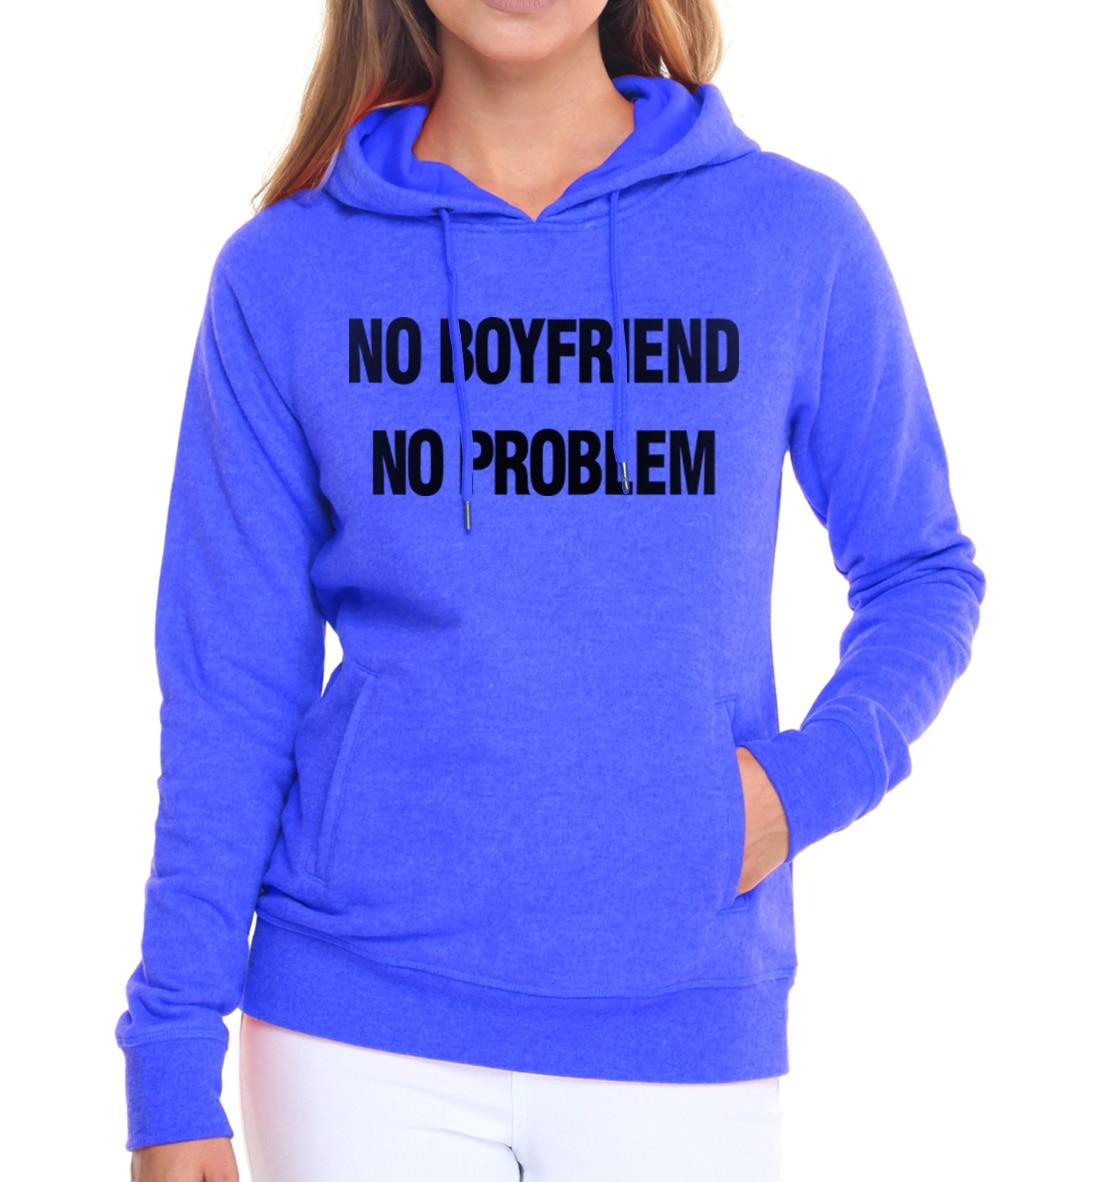 pullovers autumn winter 2019 NO BOYFRIEND NO PROBLEM women sweatshirts fashion harajuku brand tracksuits Casual kpop hoodies mma